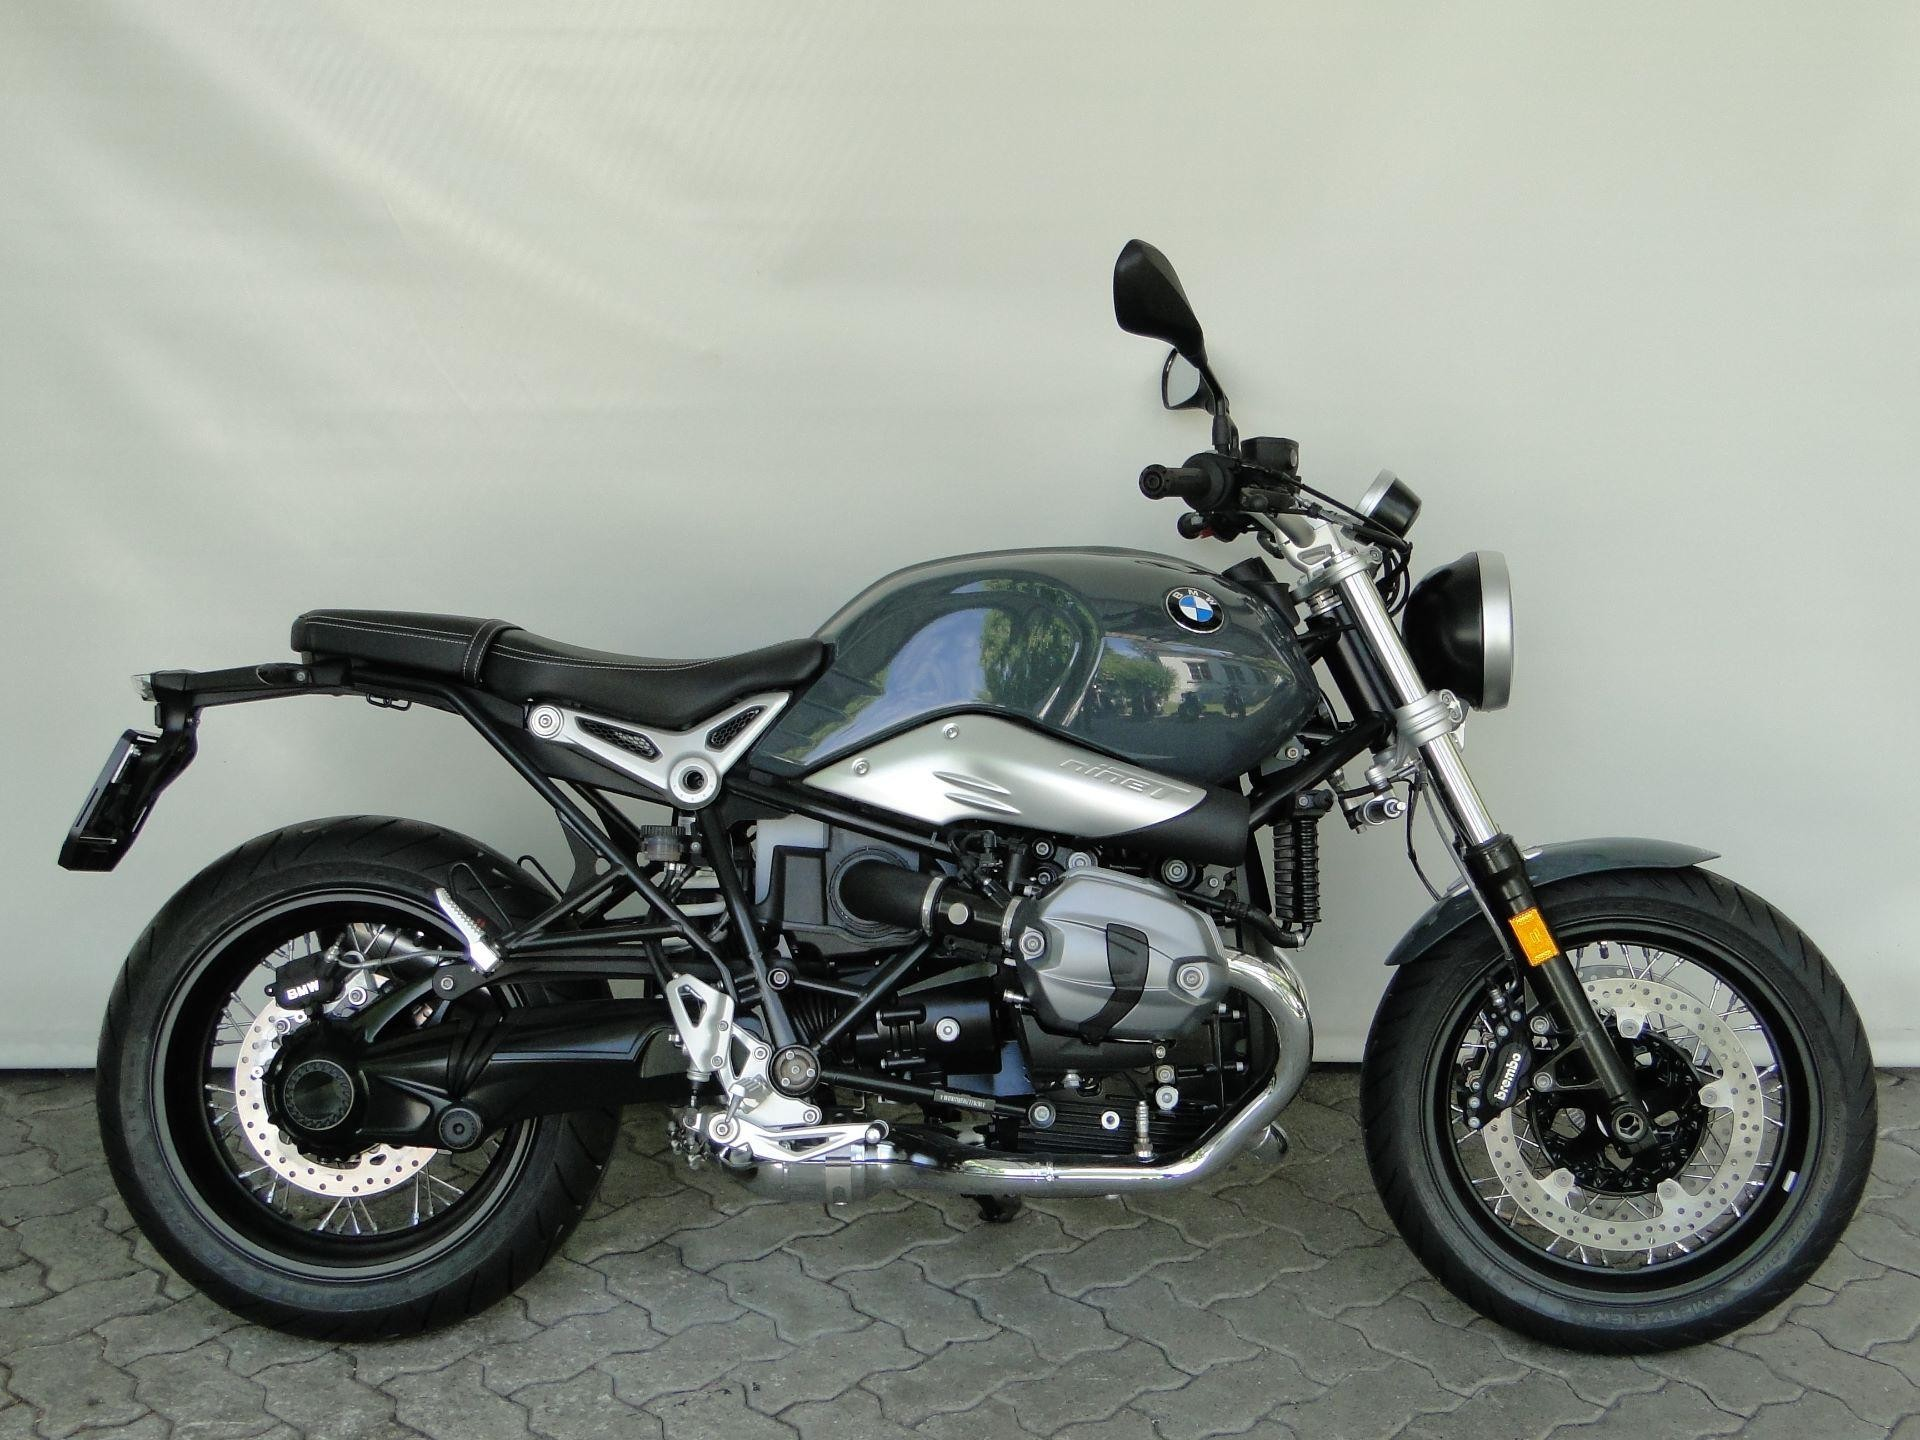 motorrad vorf hrmodell kaufen bmw r nine t pure abs neufahrzeug hobi moto ag winterthur. Black Bedroom Furniture Sets. Home Design Ideas